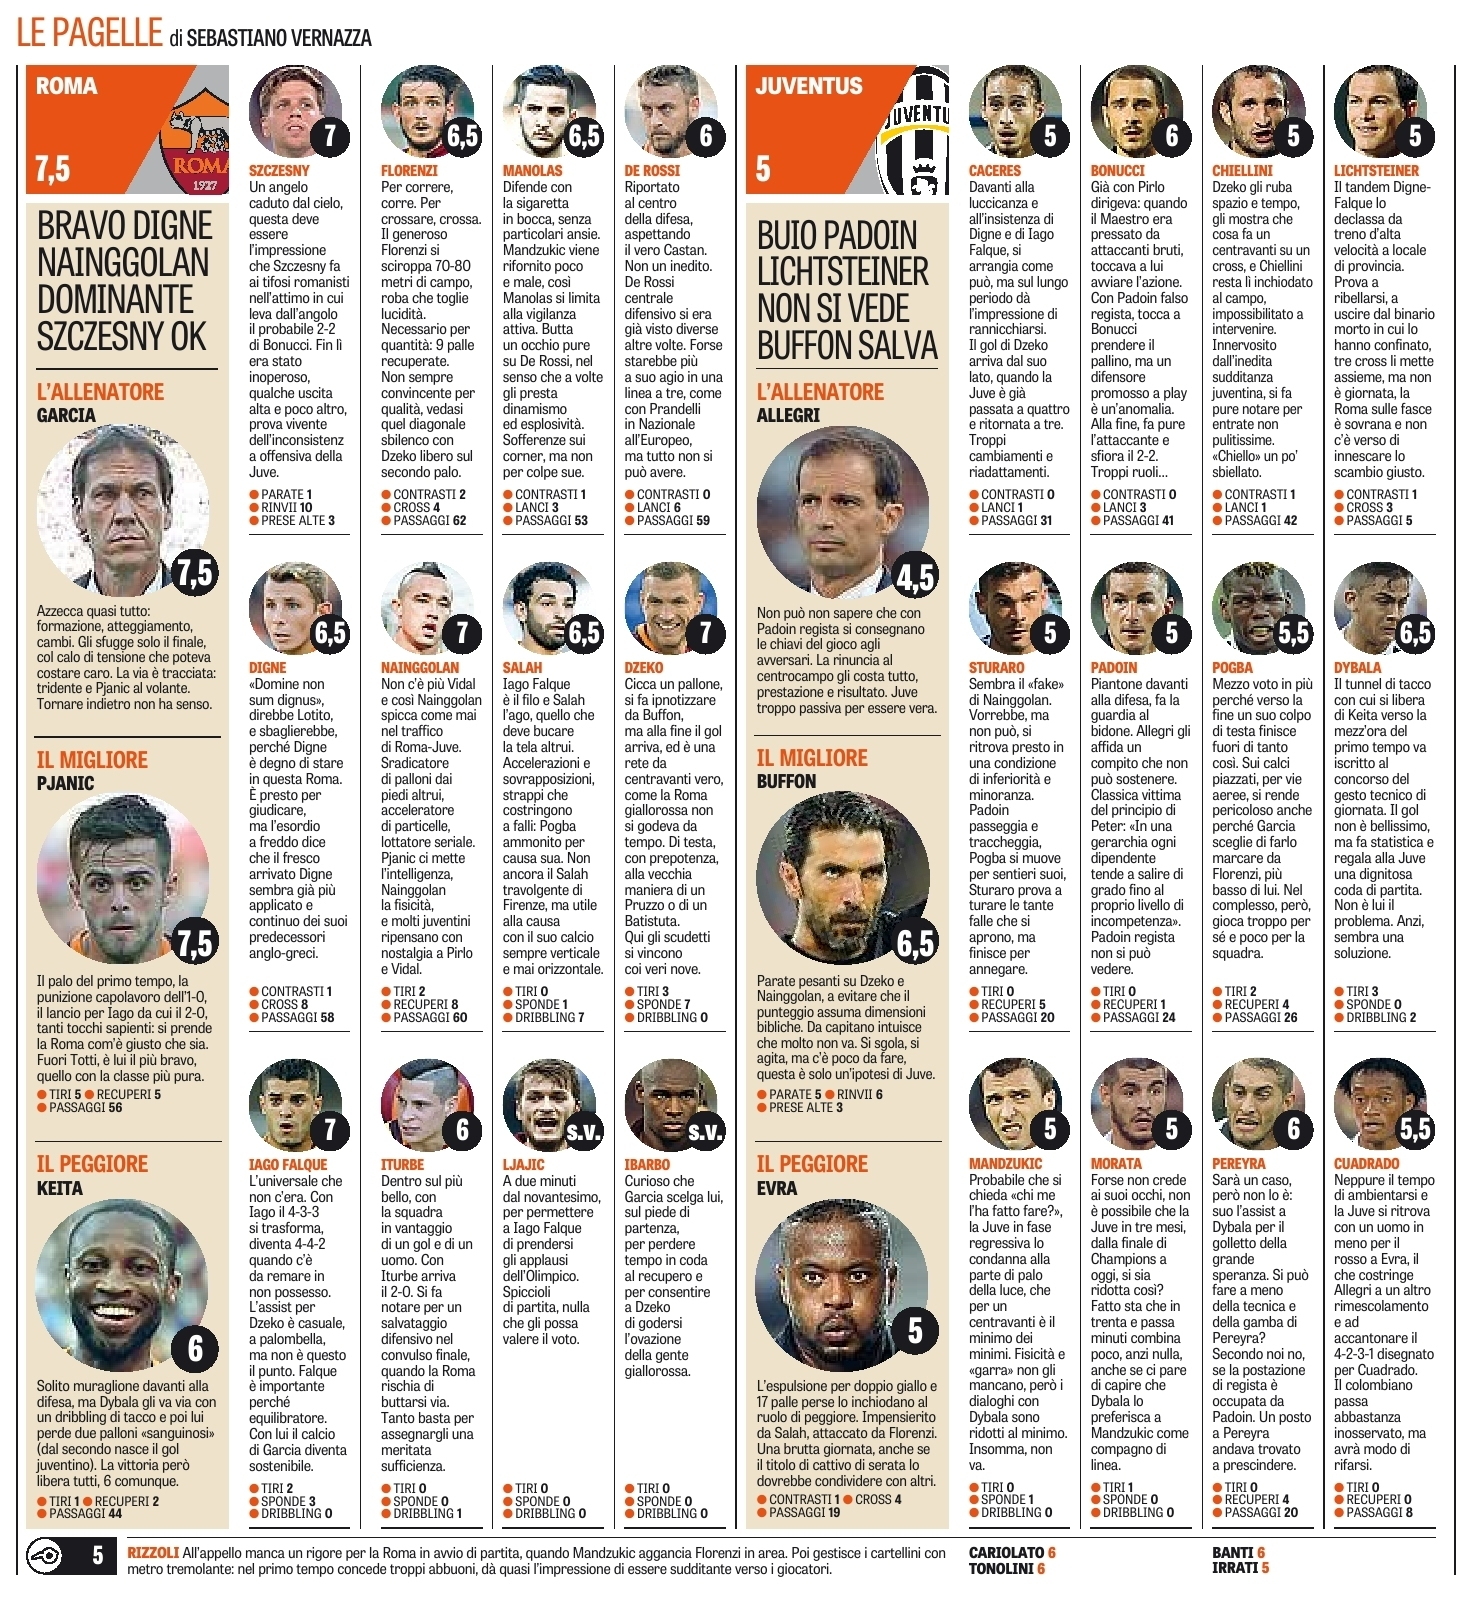 Roma - Juventus, 2015.08.30., 18:00 Digi1 G-pglj5jcp